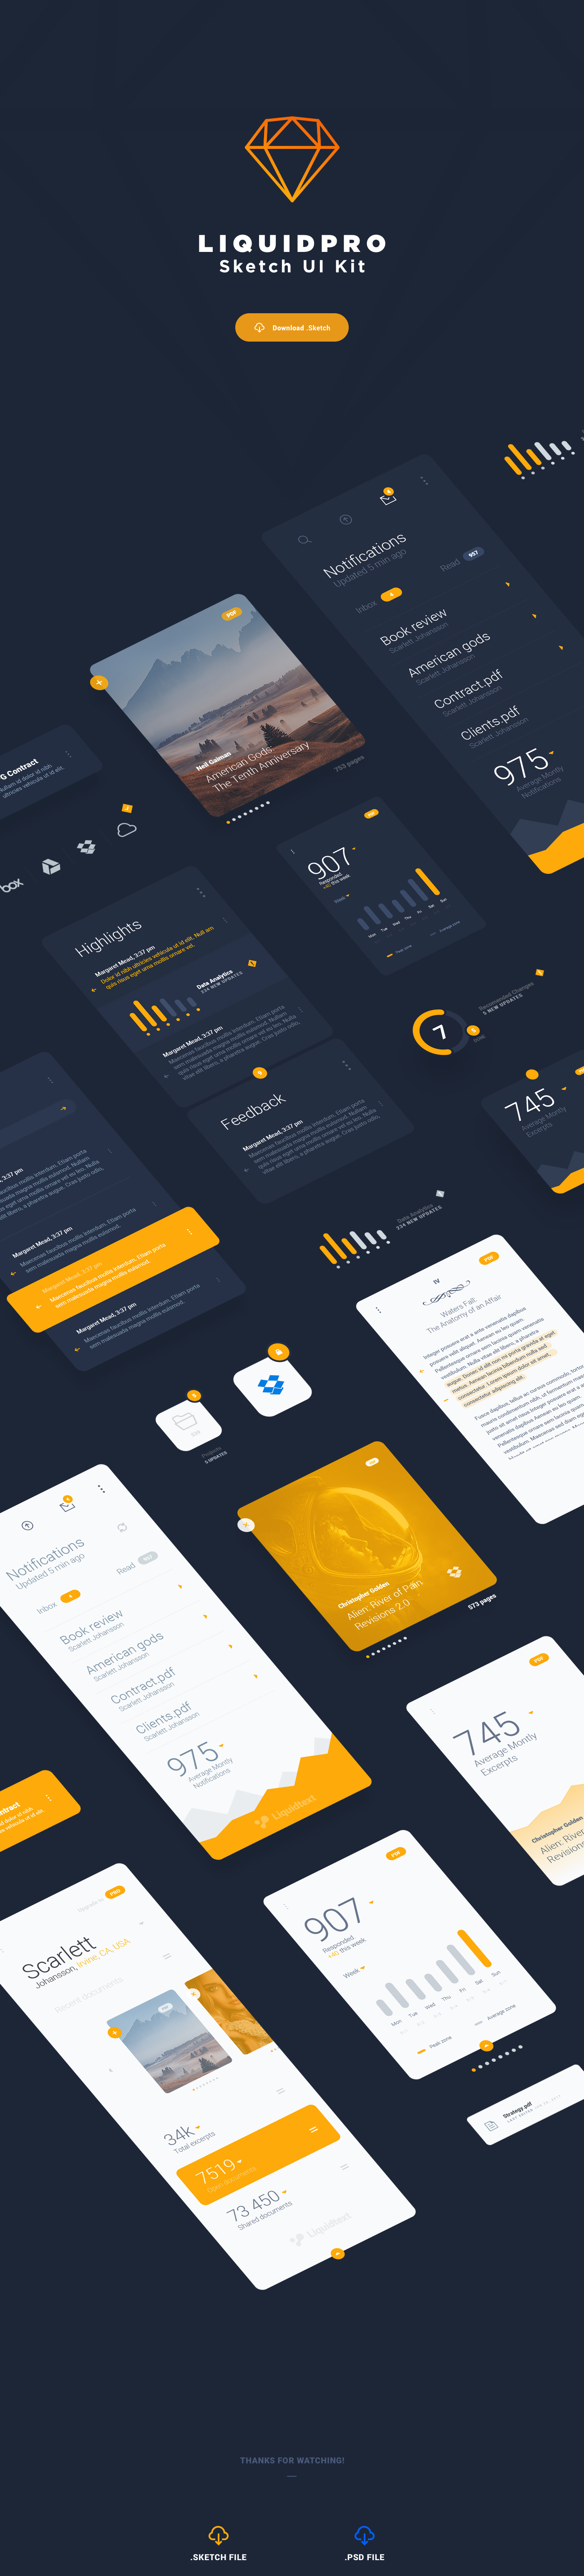 LiquidPro – Free Sketch UI Kit